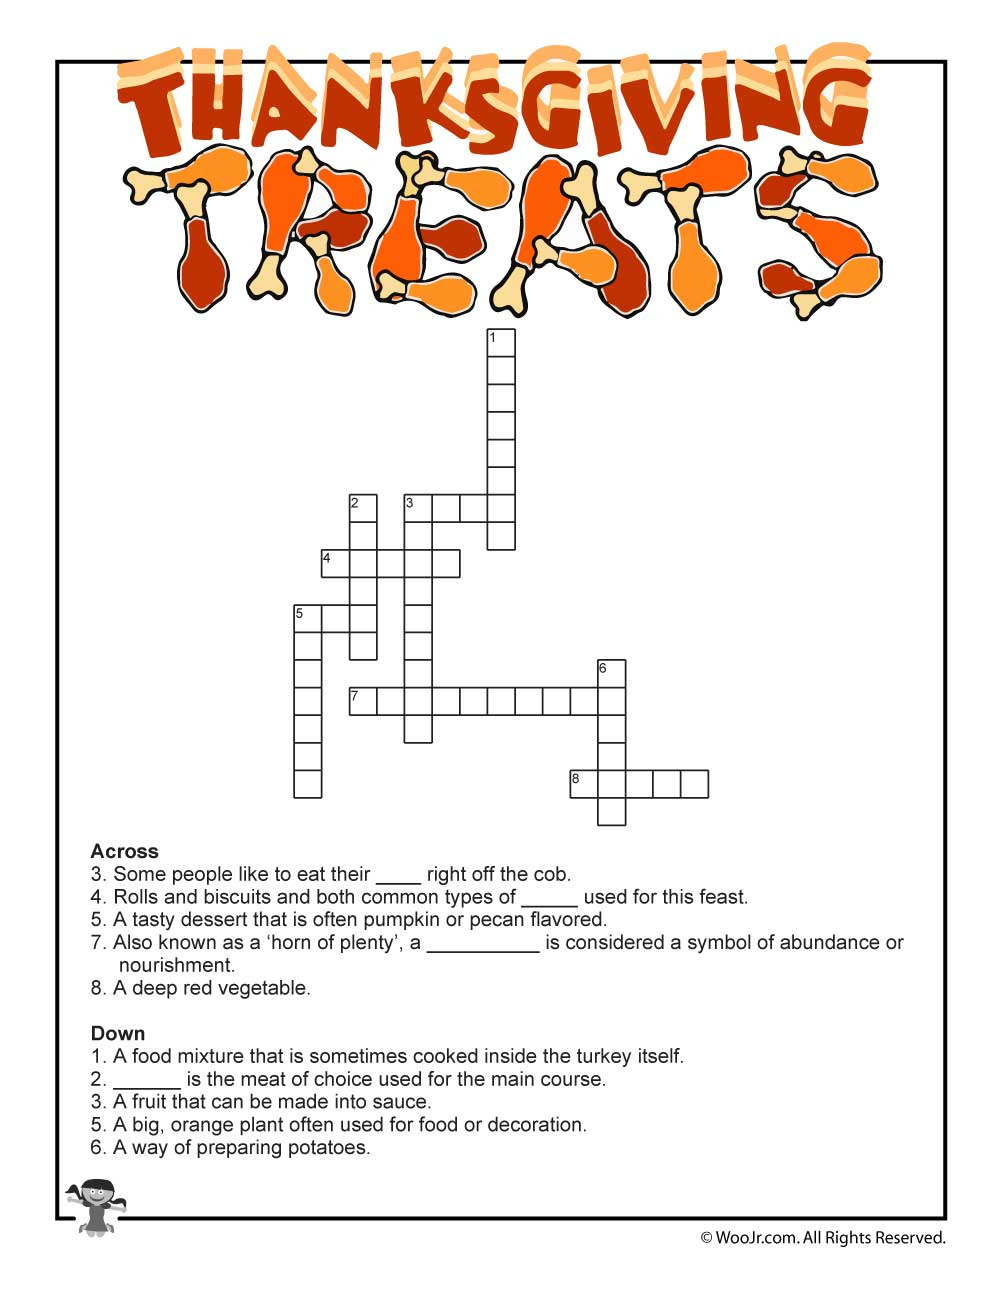 Thanksgiving Crossword Puzzle | Woo! Jr. Kids Activities - Thanksgiving Crossword Puzzle Printable